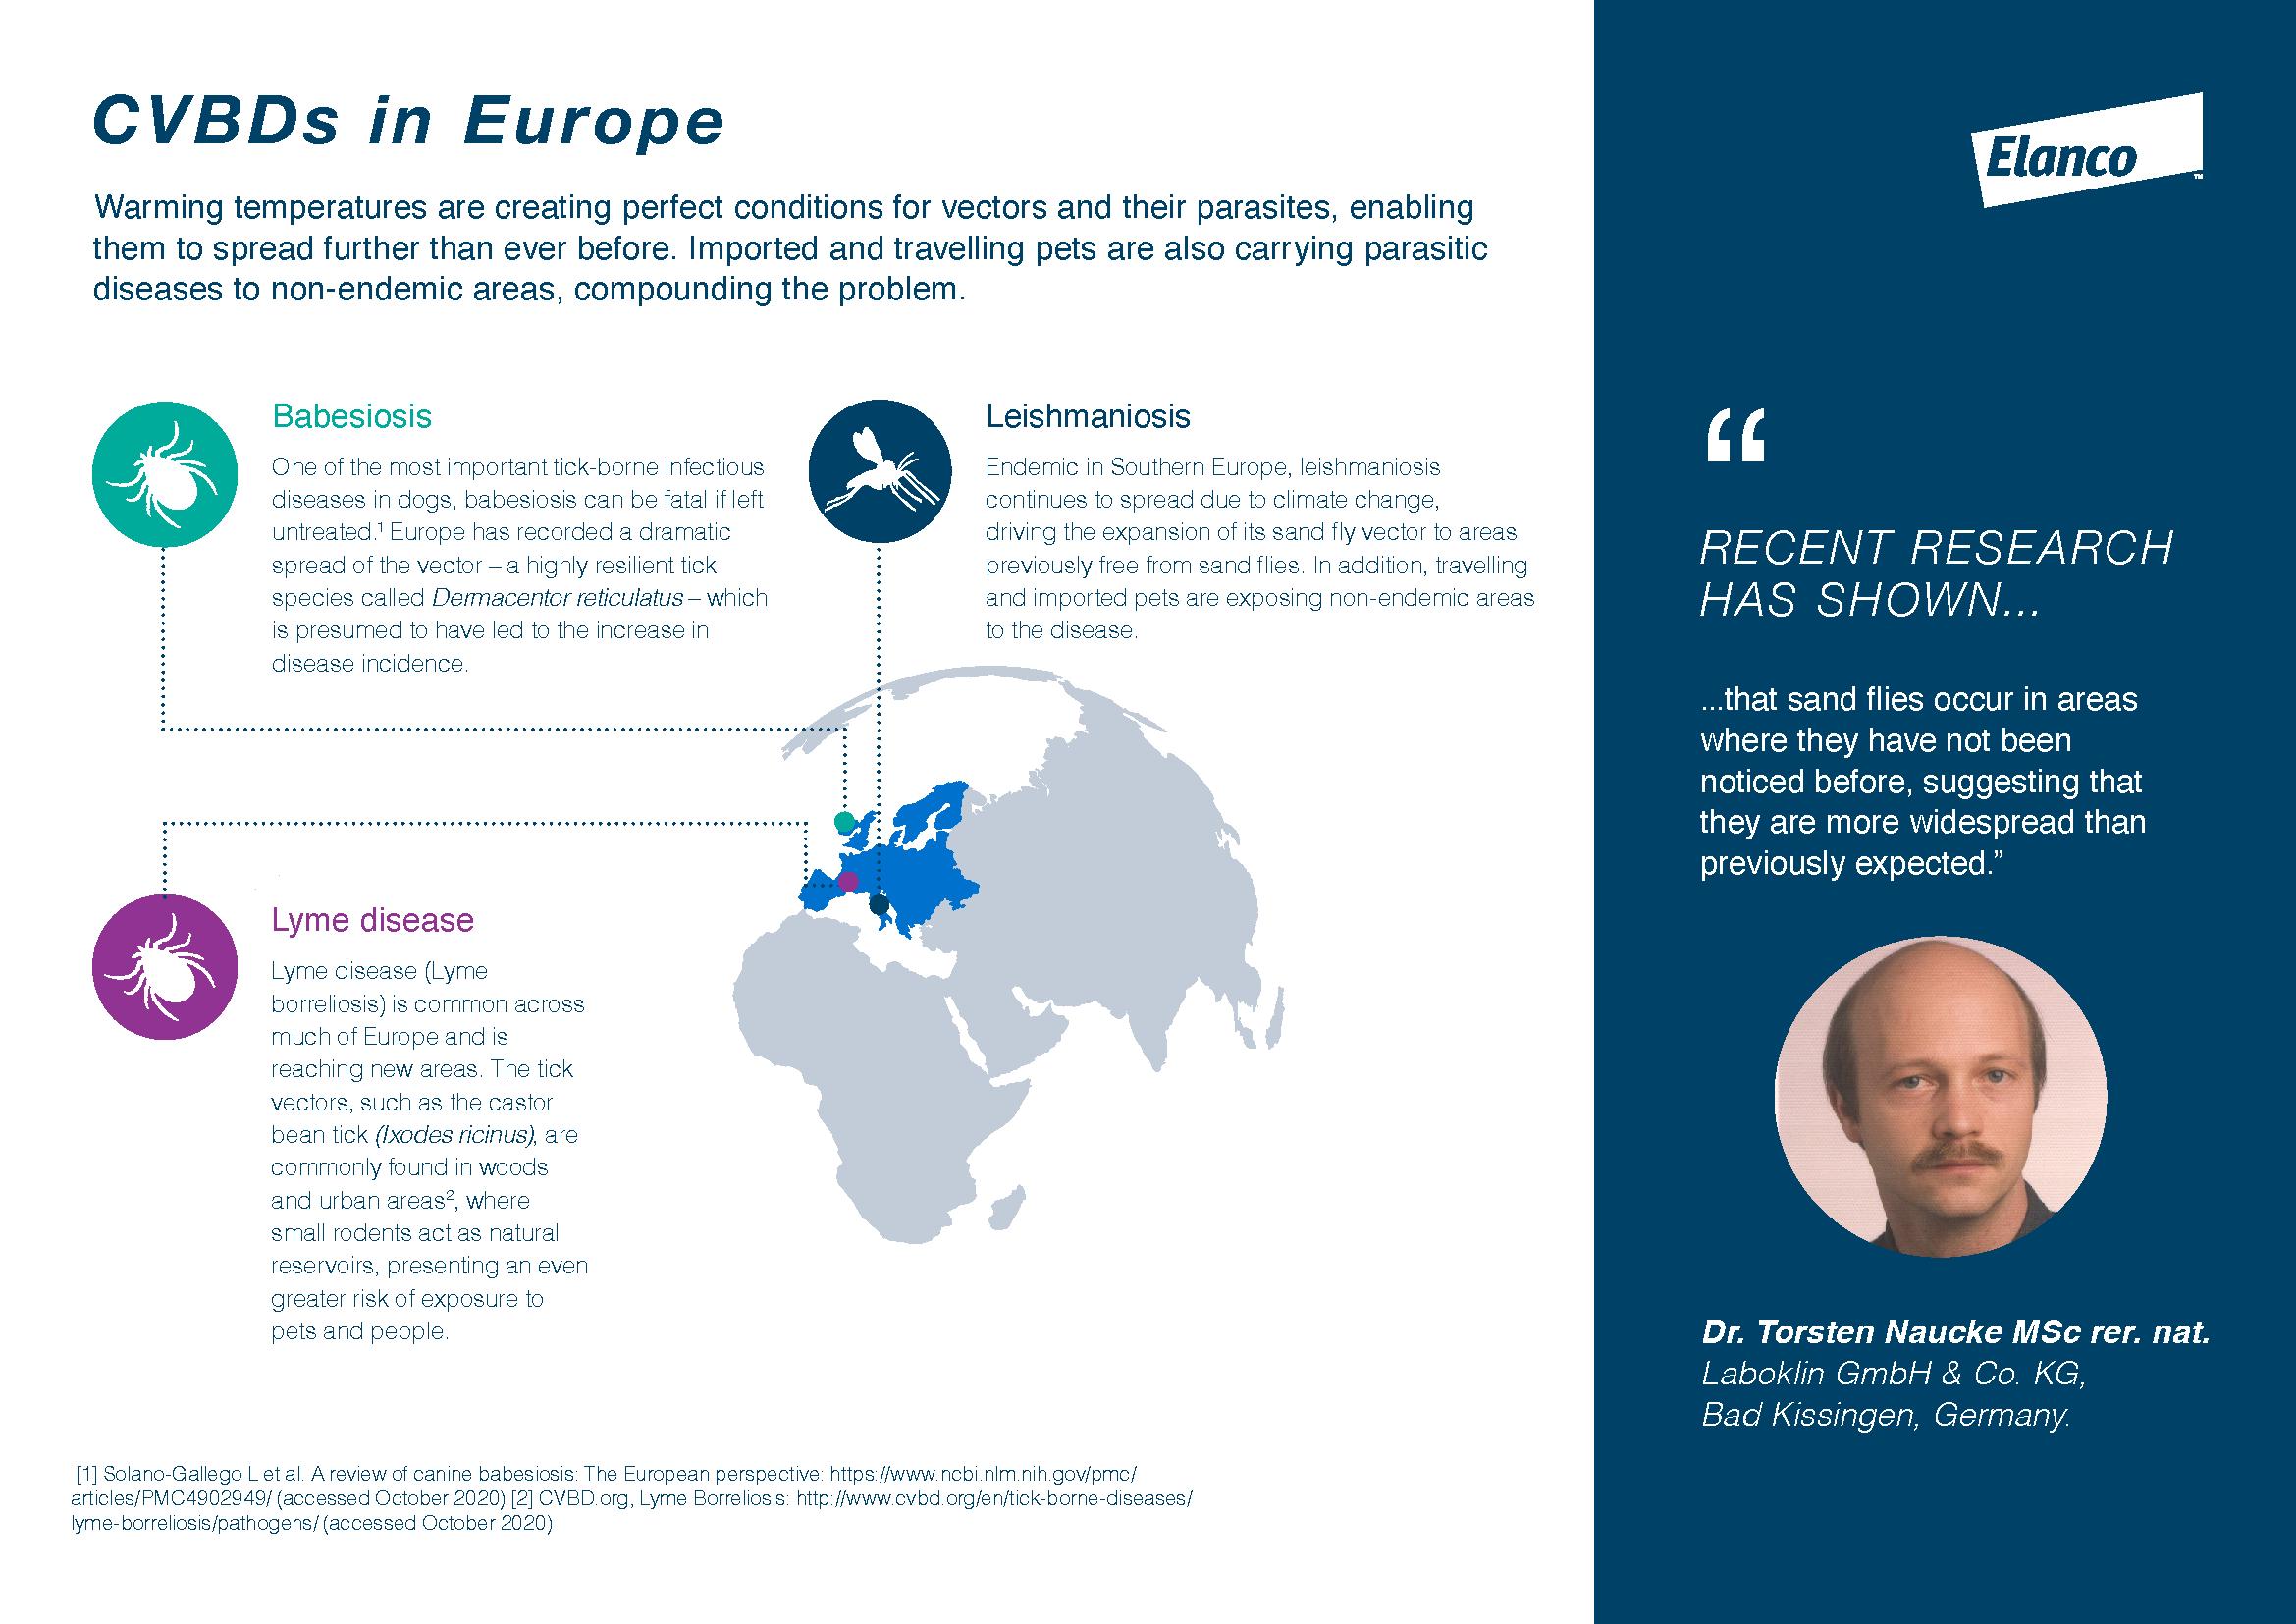 CVBDs in Europe